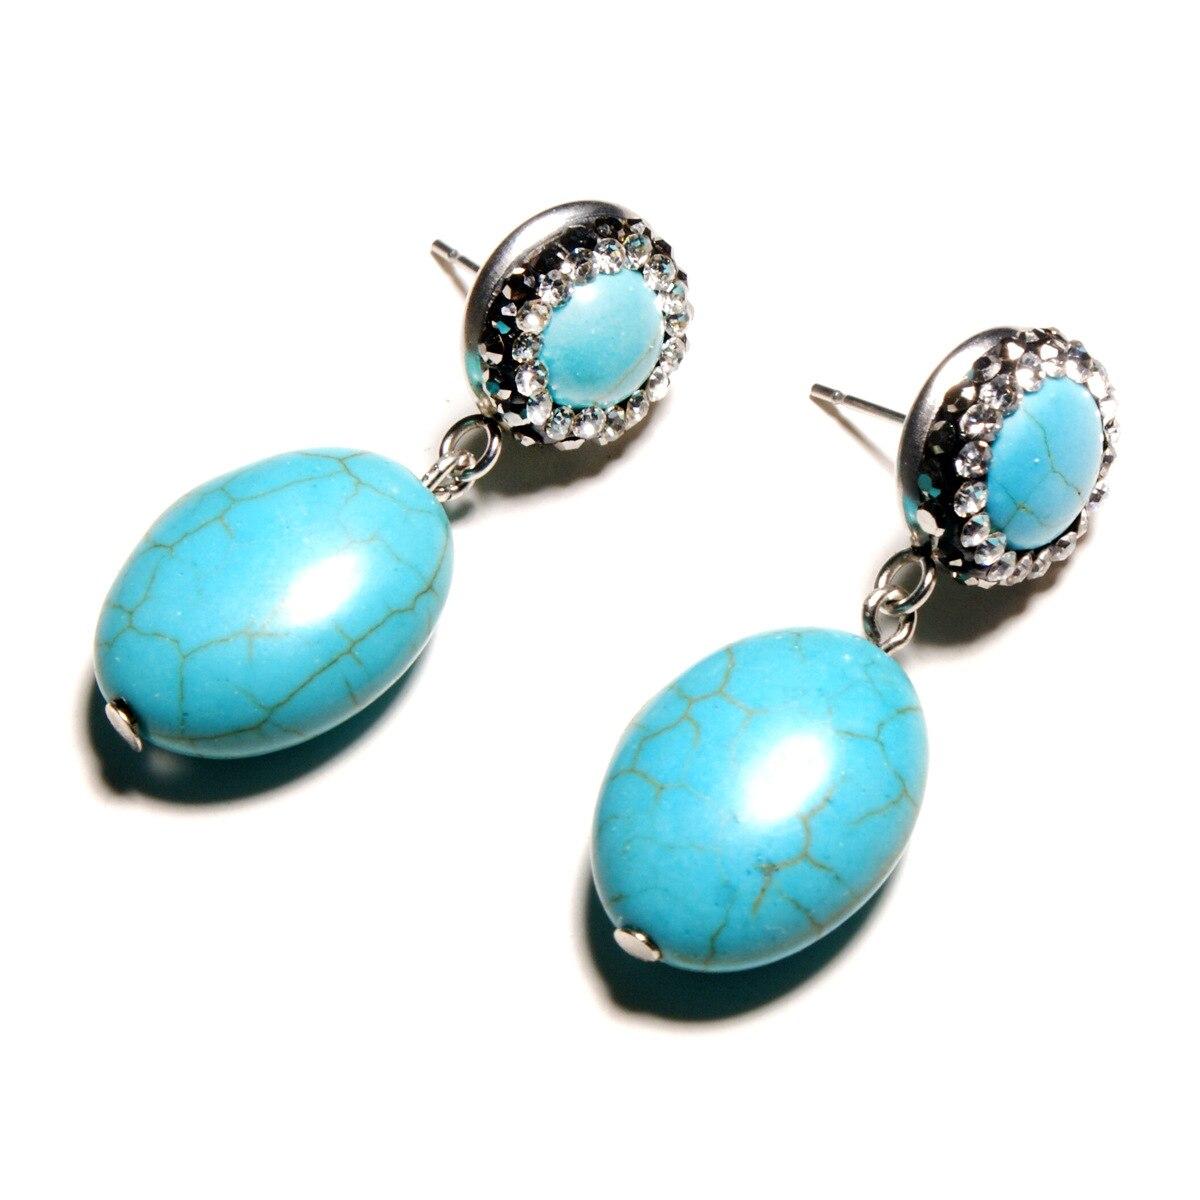 Bohemian Green Stone Egg-shaped Earrings Ladies Cute European and American Fashion Jewelry Gift